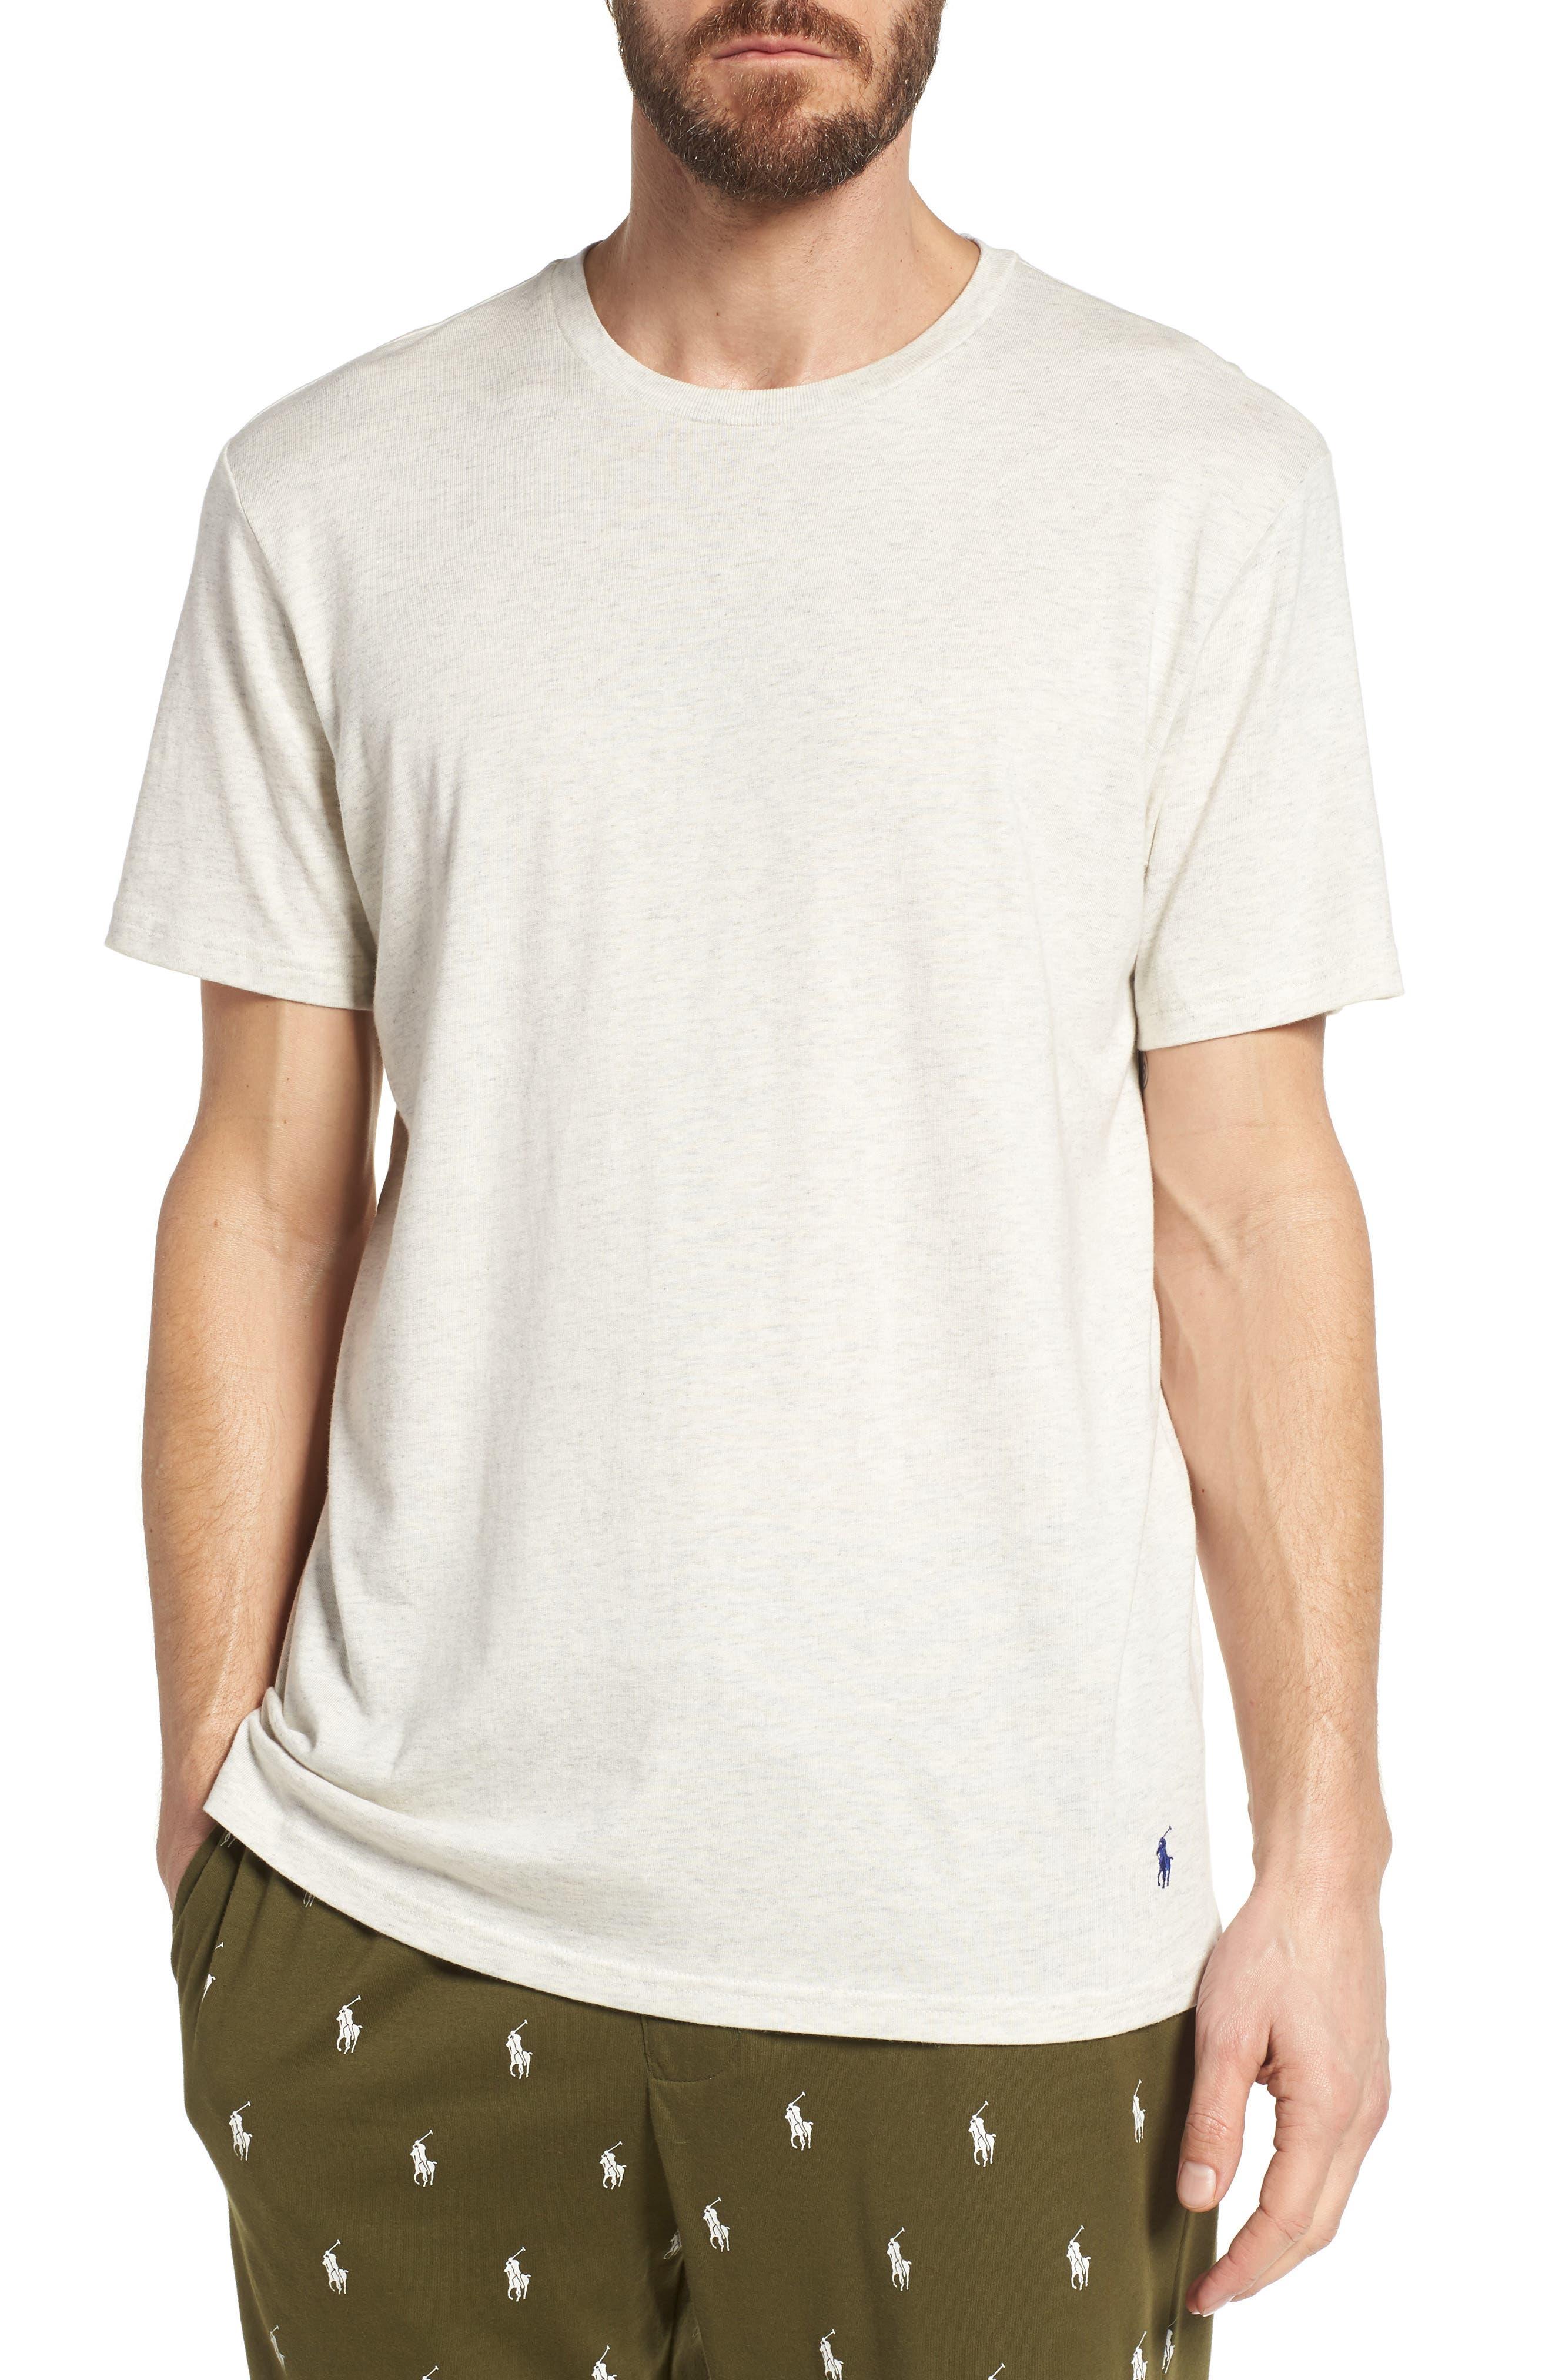 Supreme Comfort Crewneck T-Shirt,                             Main thumbnail 1, color,                             Sand Heather/ Bright Navy